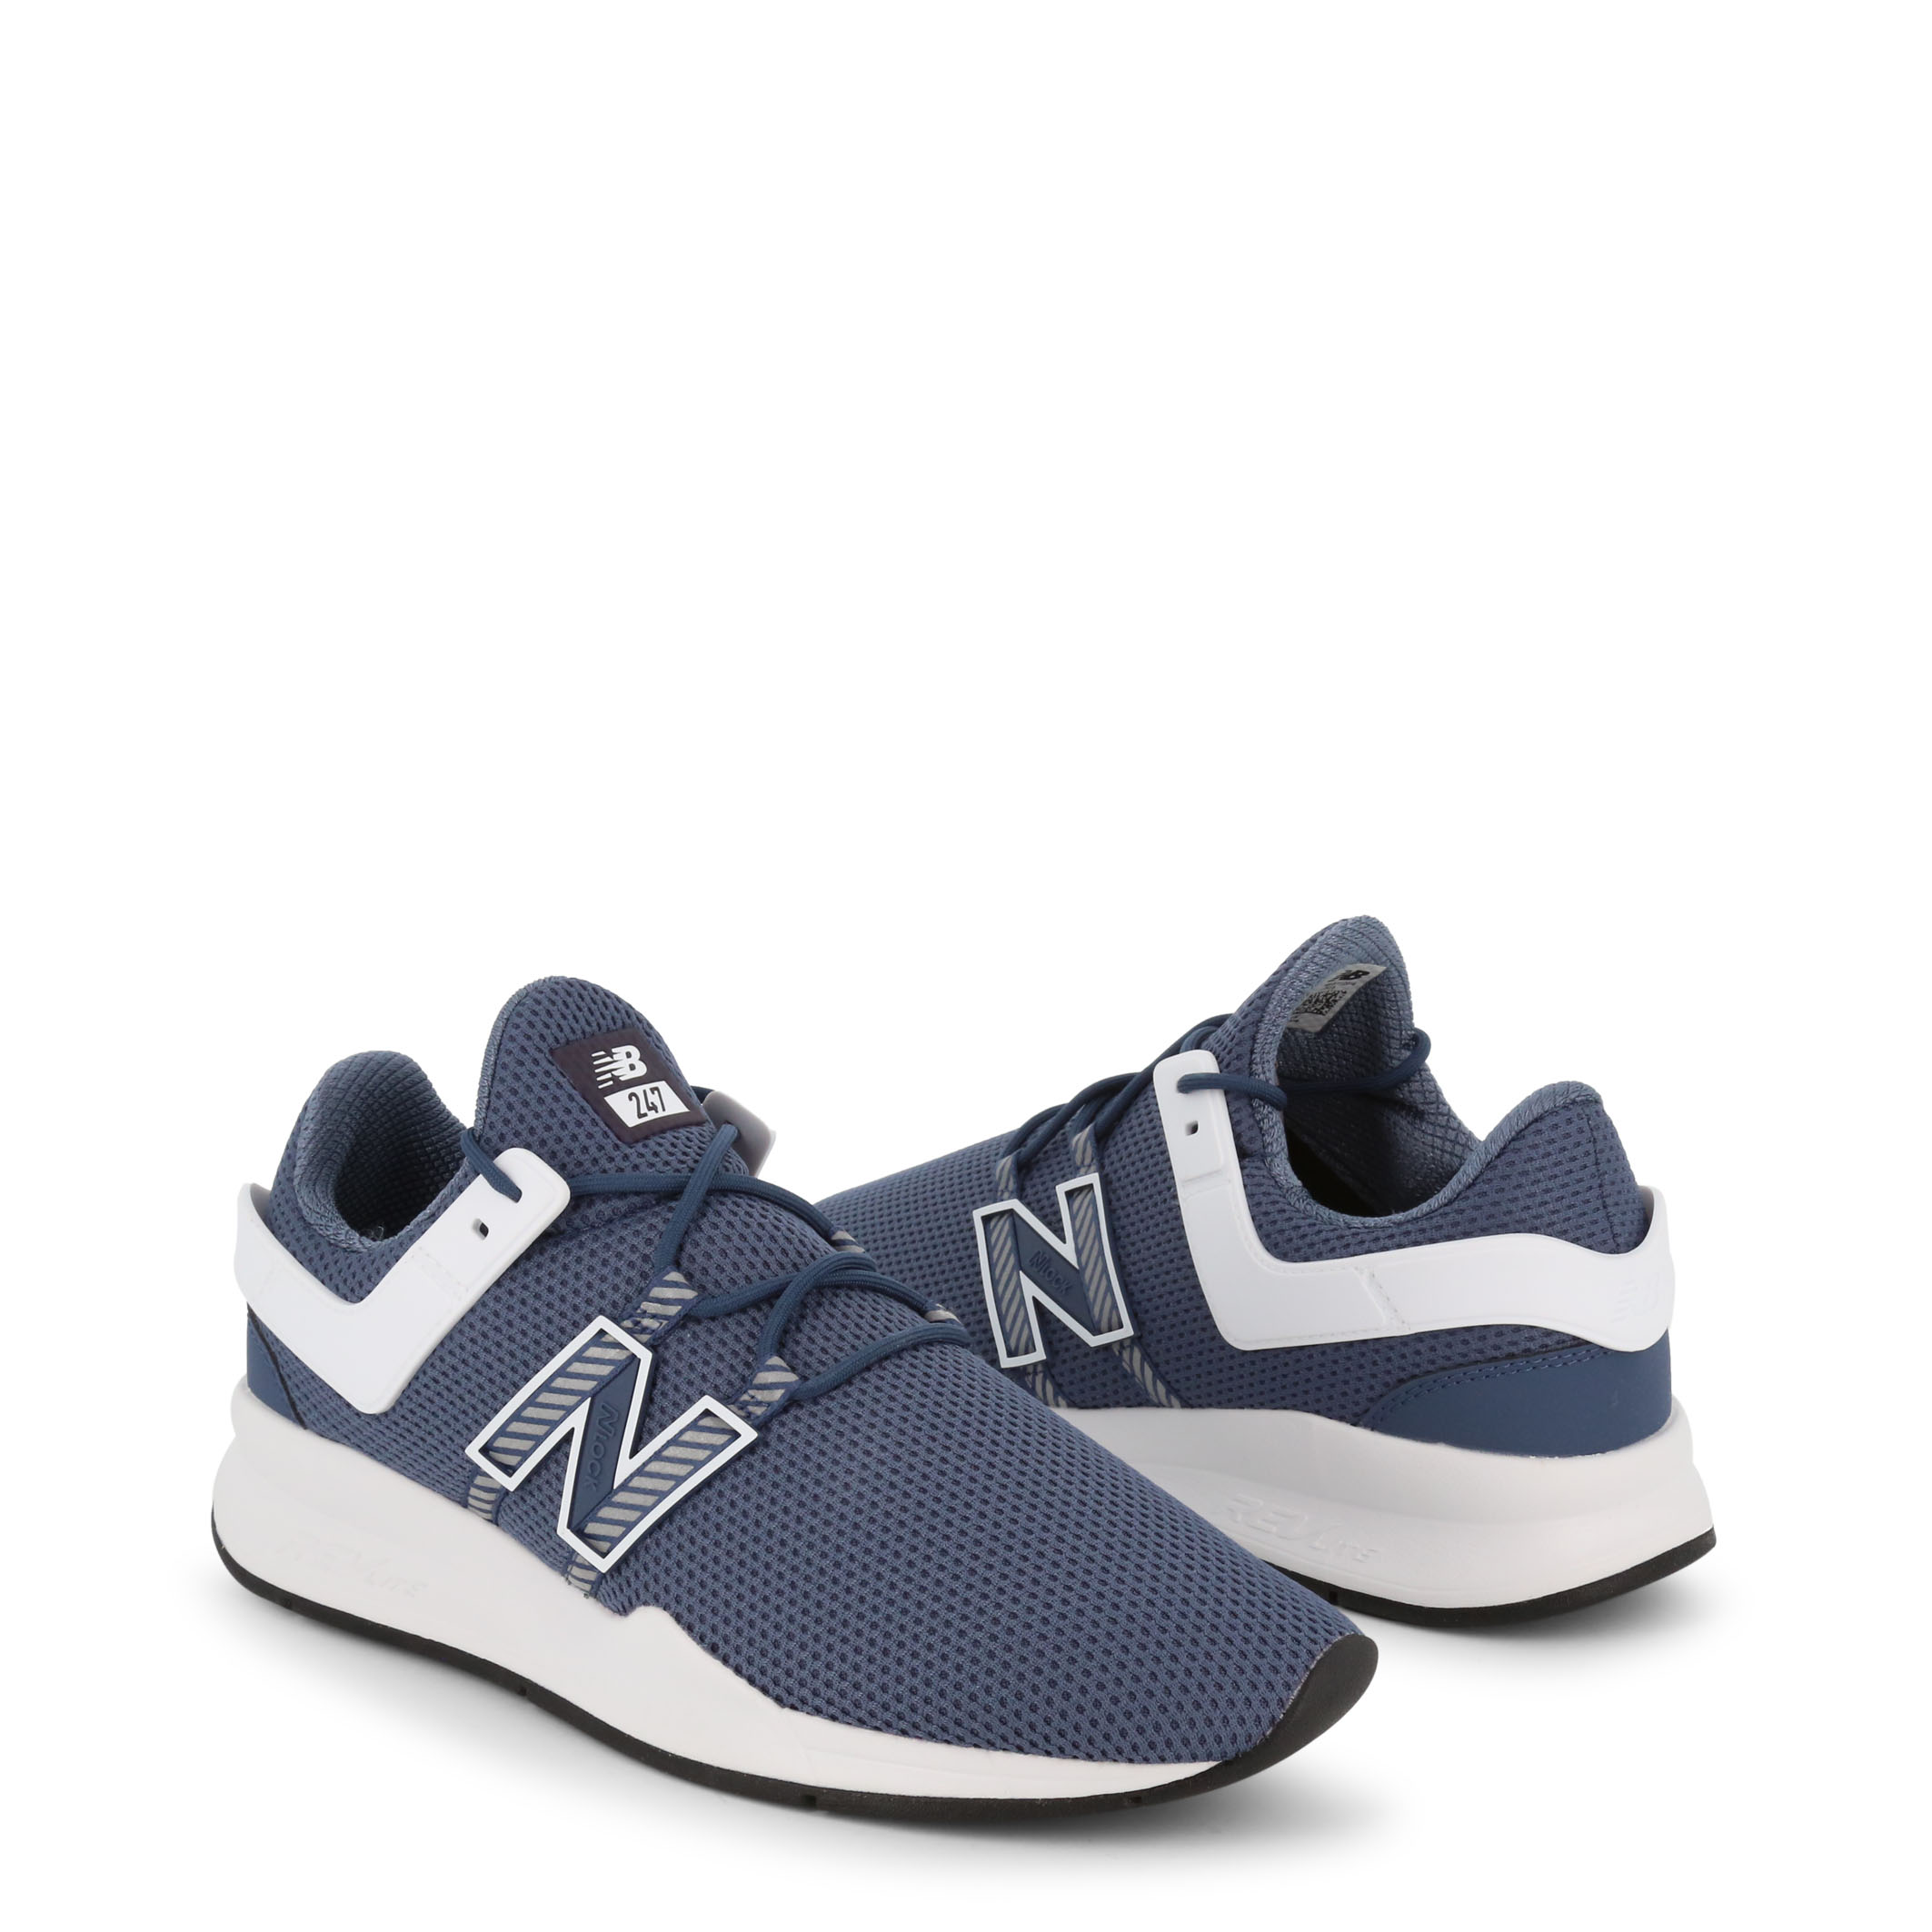 Baskets / Sport  New balance MS247 blue